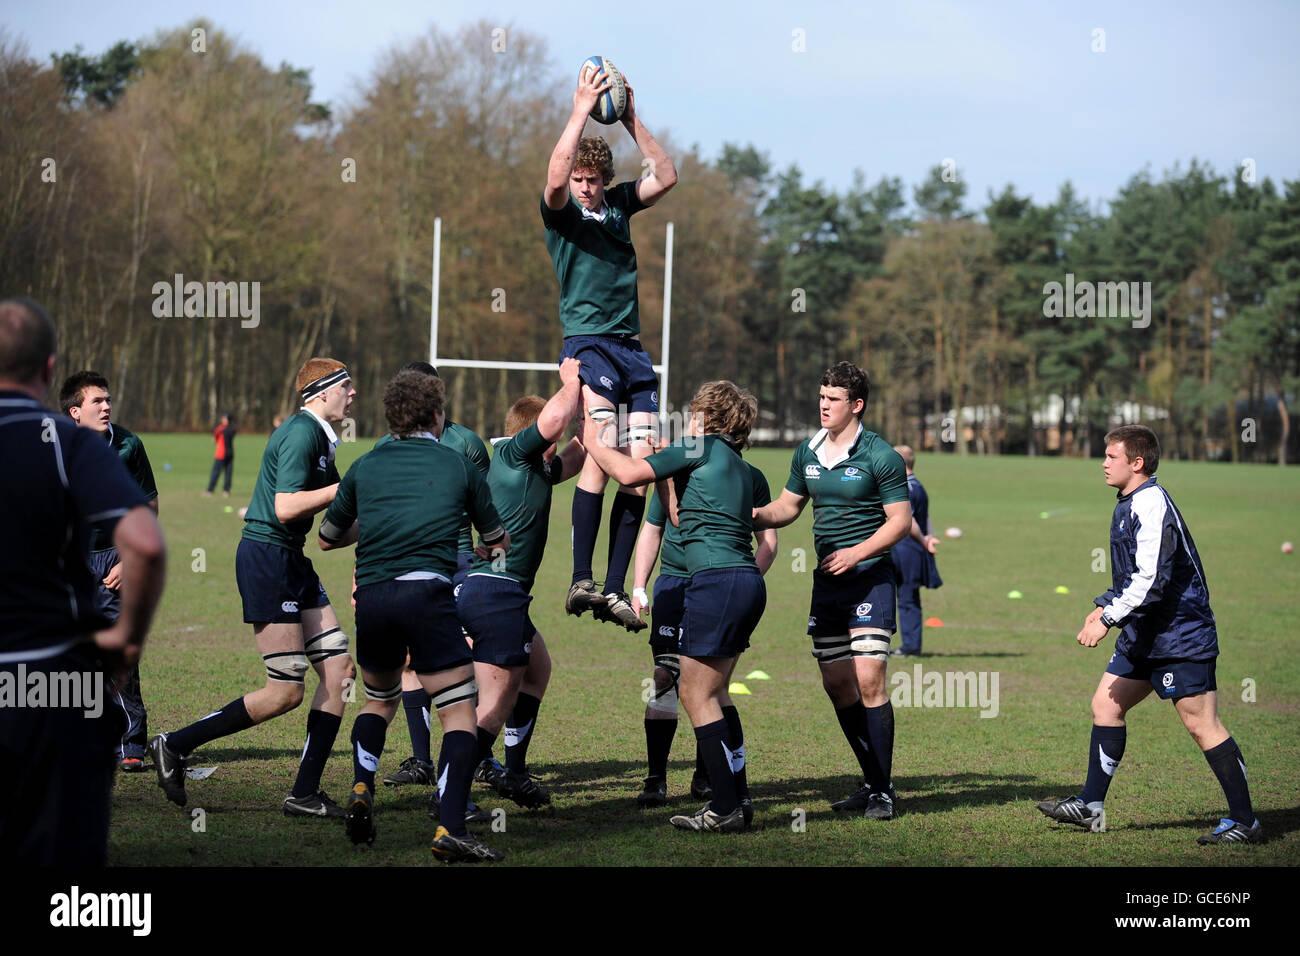 Rugby Union - Wellington International Festival - Scotland U17 v Canada U17 - Wellington College - Stock Image